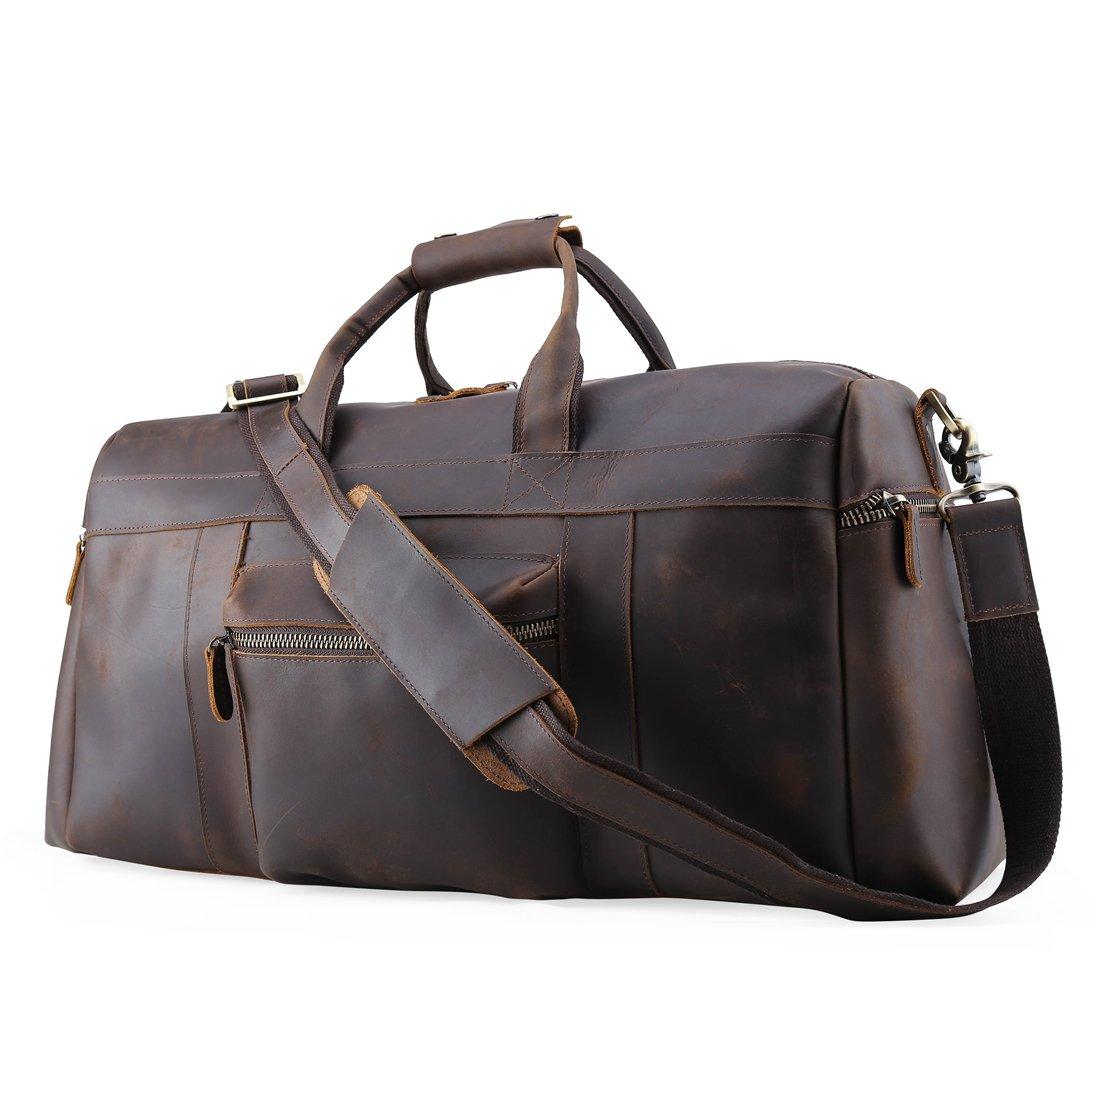 Mens Retro Real Travel Luggage Duffle Gym Bags Gym Sports Weekend Tote Bag by ECOFISH